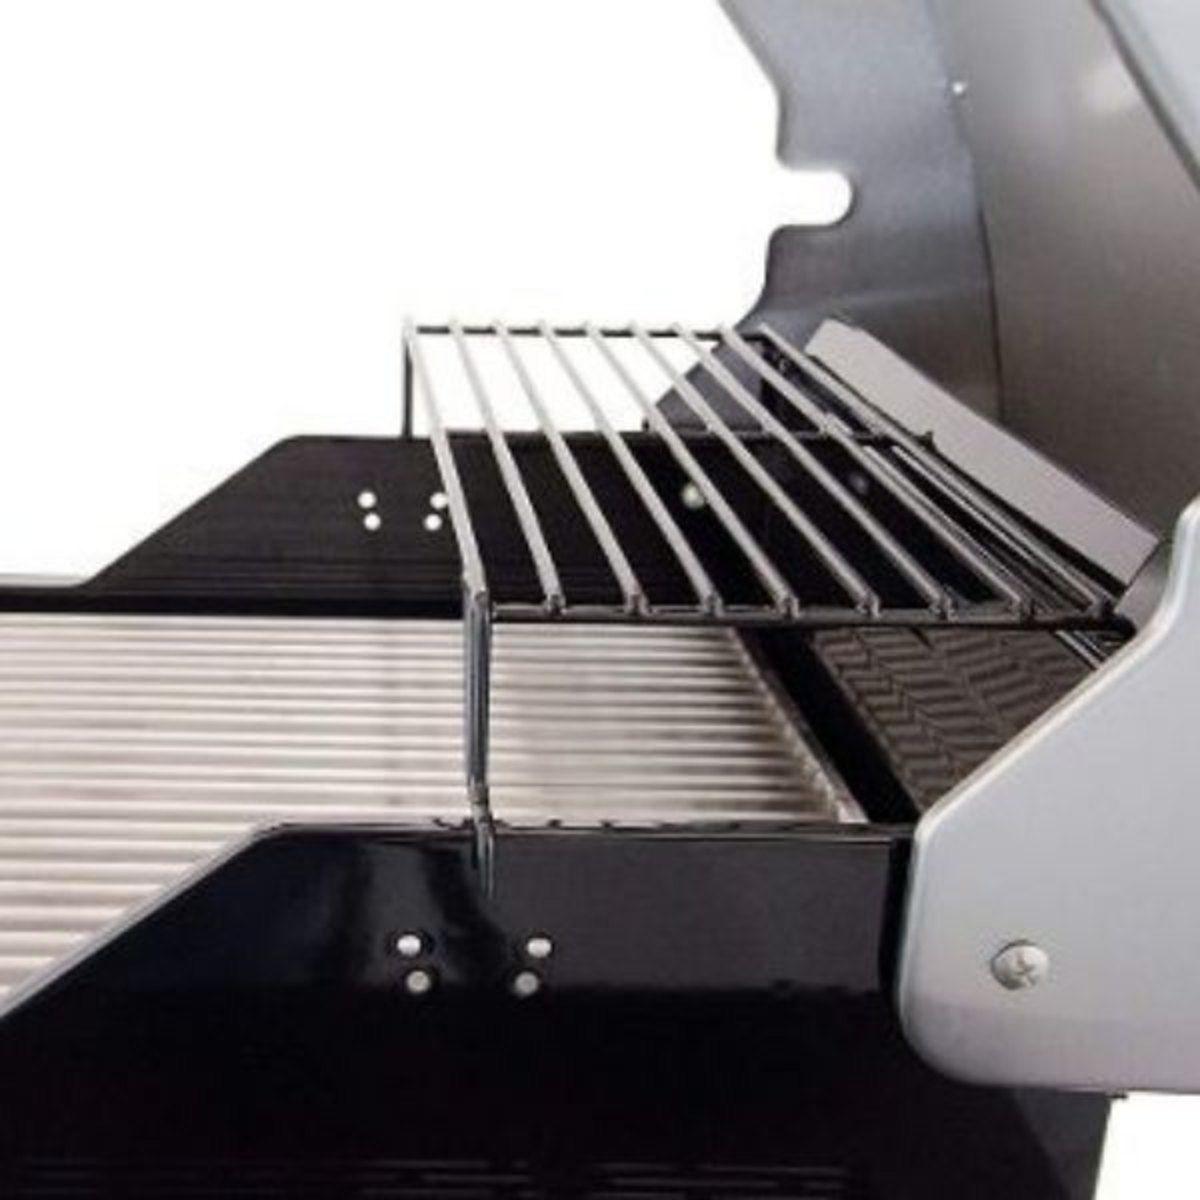 Churrasqueira À Gás Char-broil Infrared - 2 Queimadores - Char Broil